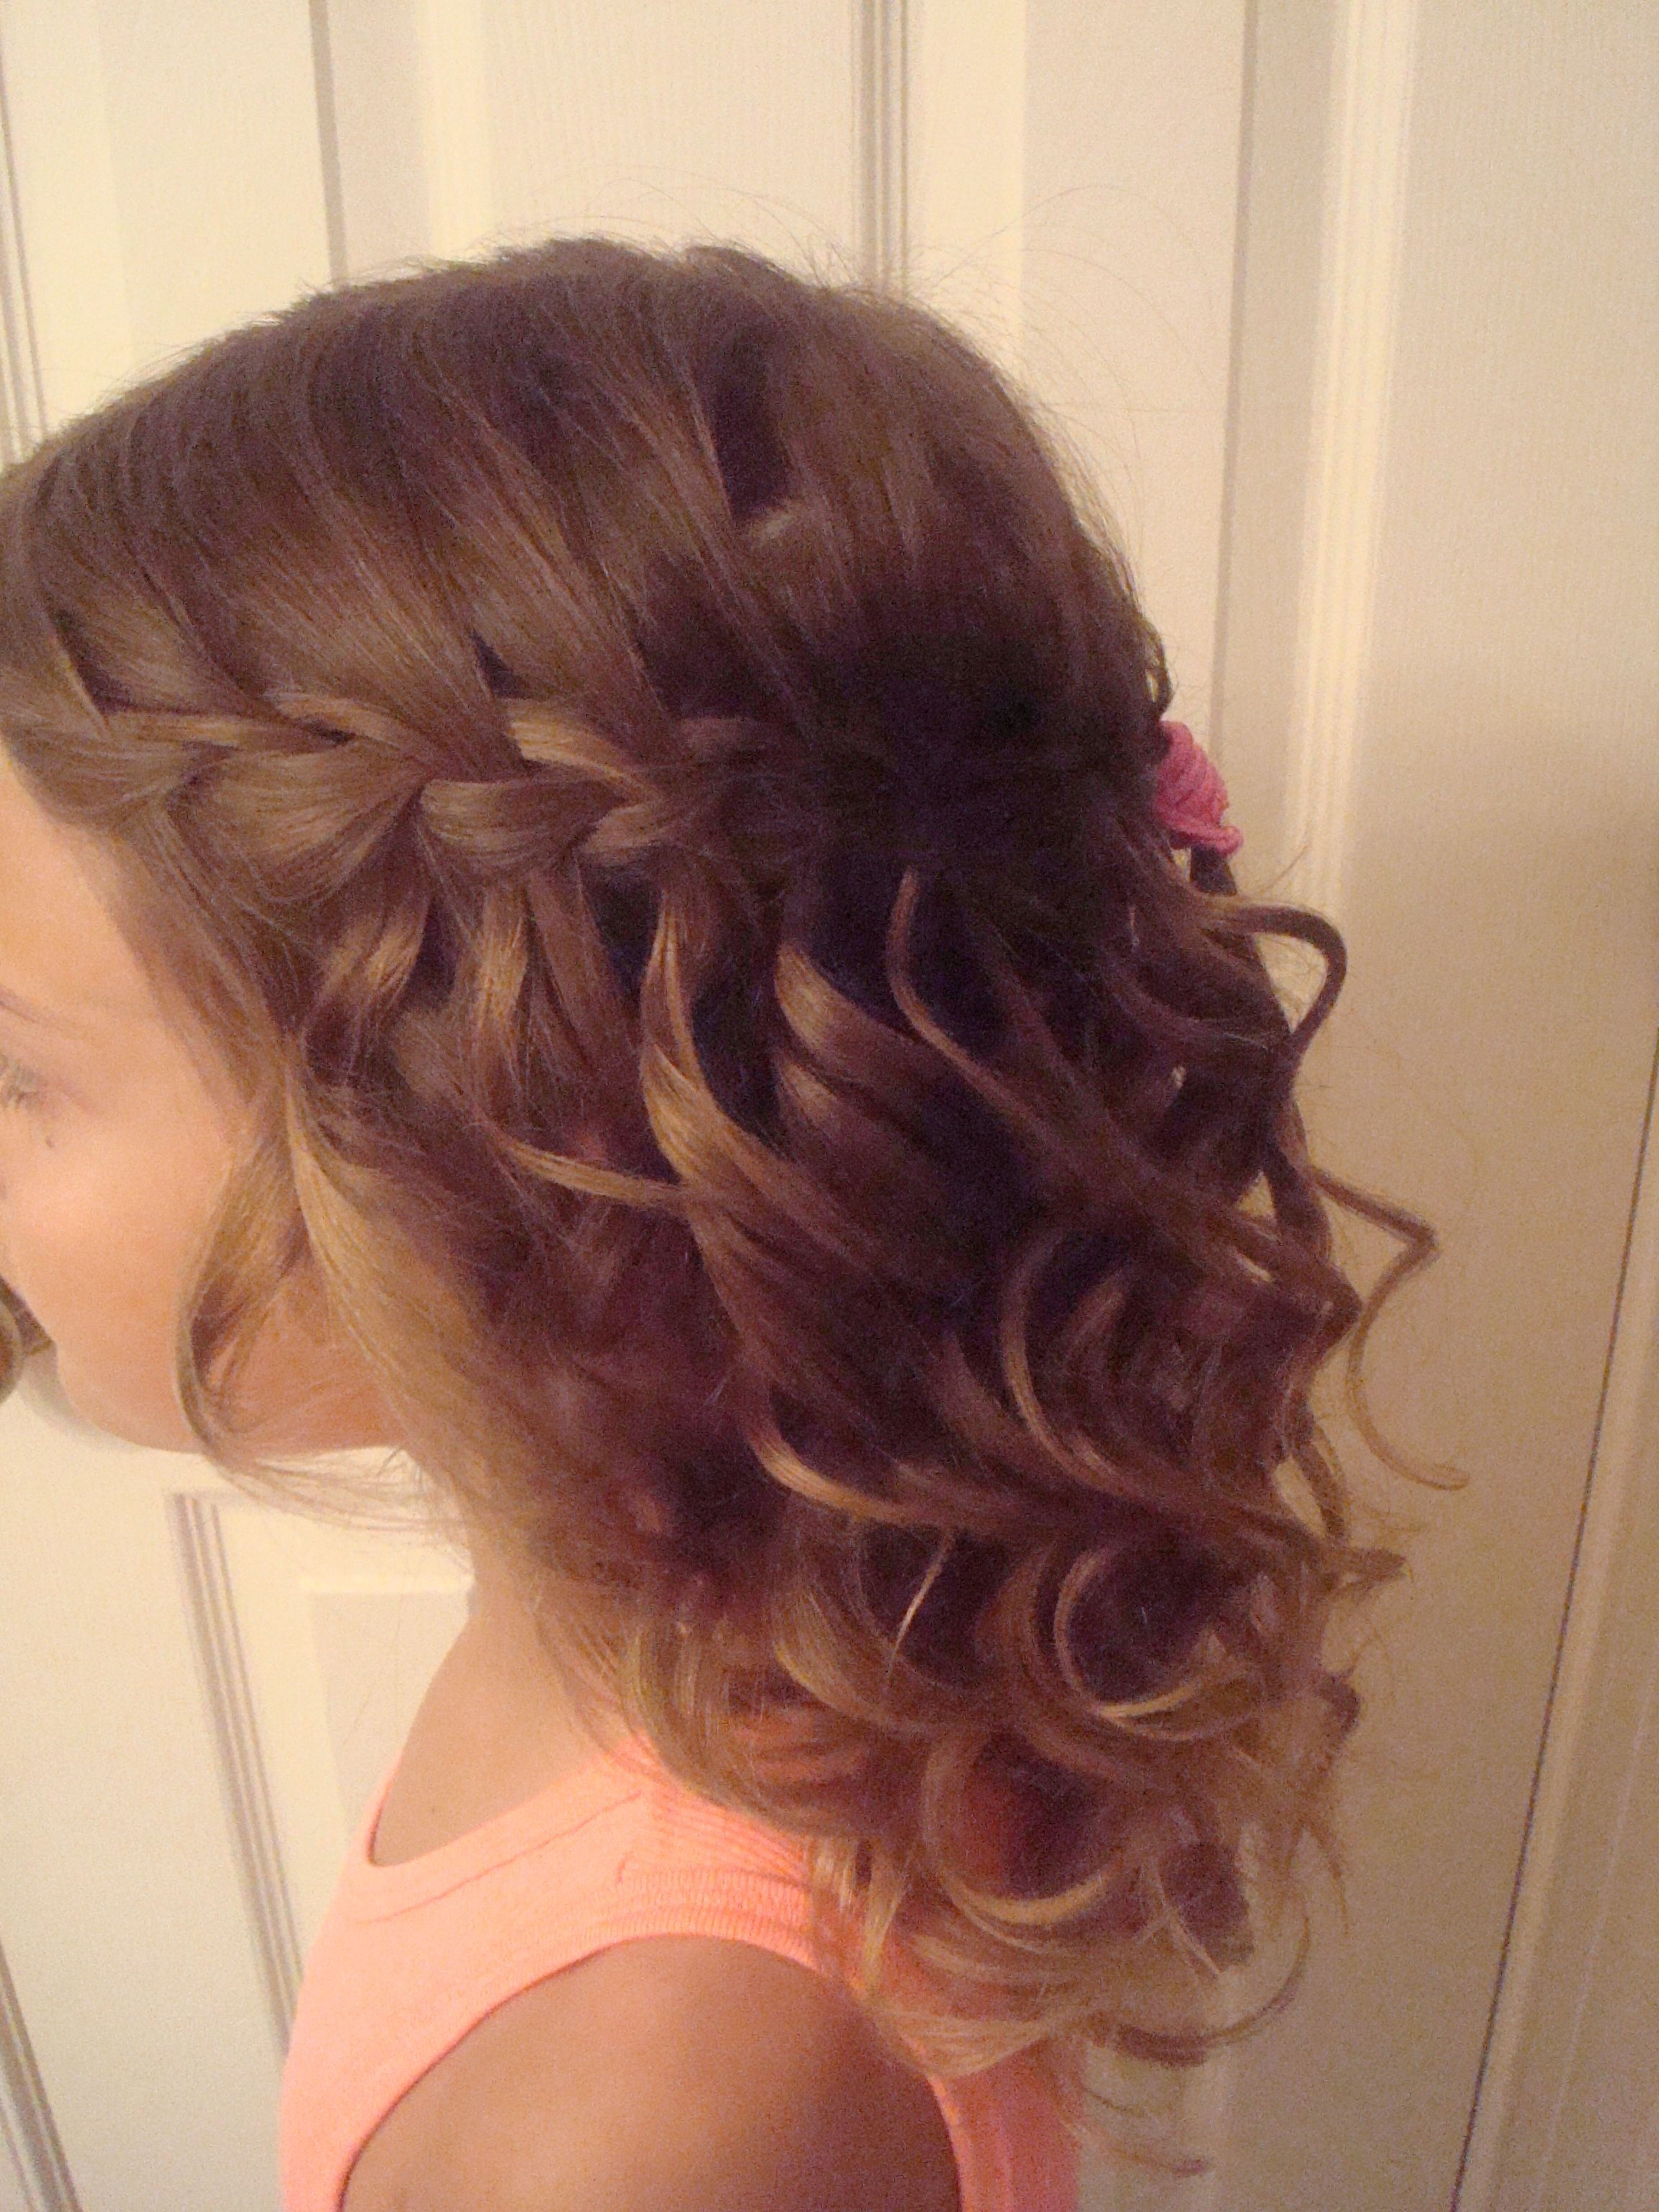 Waterfall Braid With Curls In 2019 Flower Girl Hairstyles